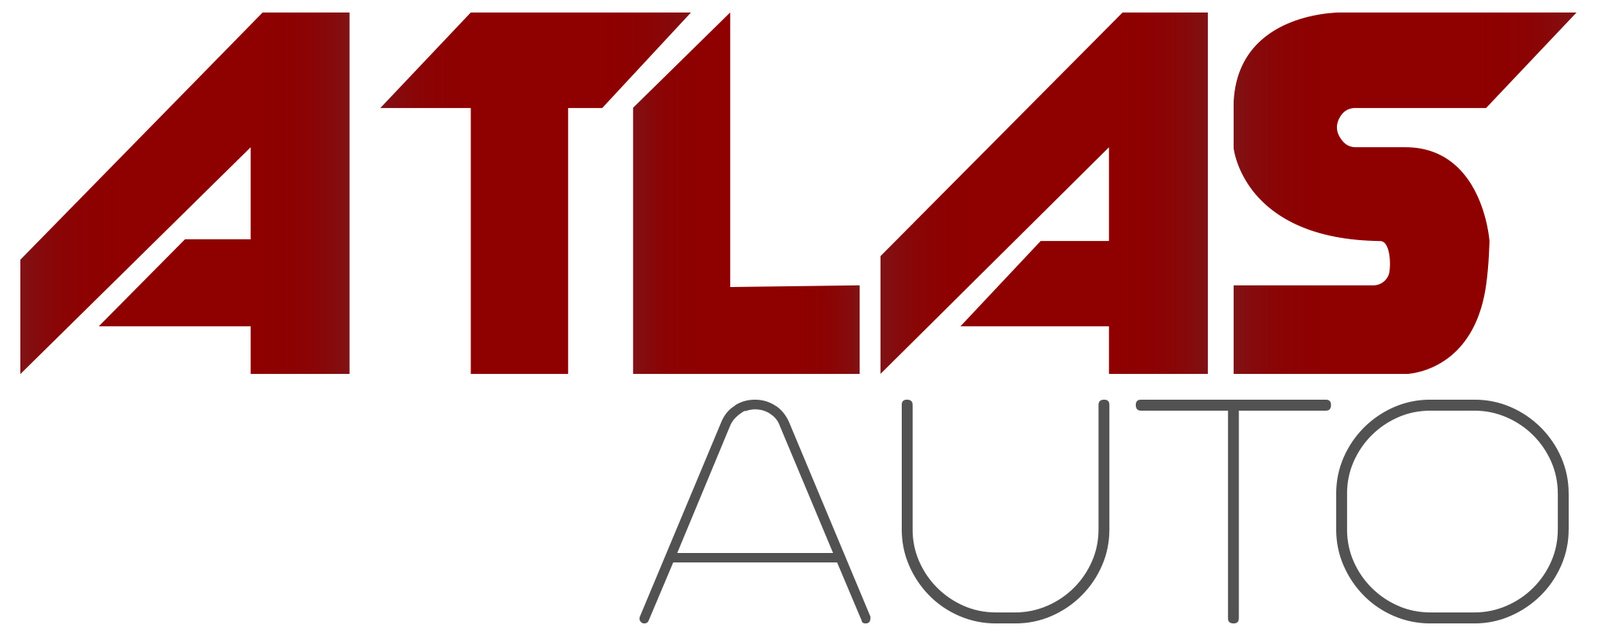 Atlas Auto & Marine Inc Venice FL Read Consumer